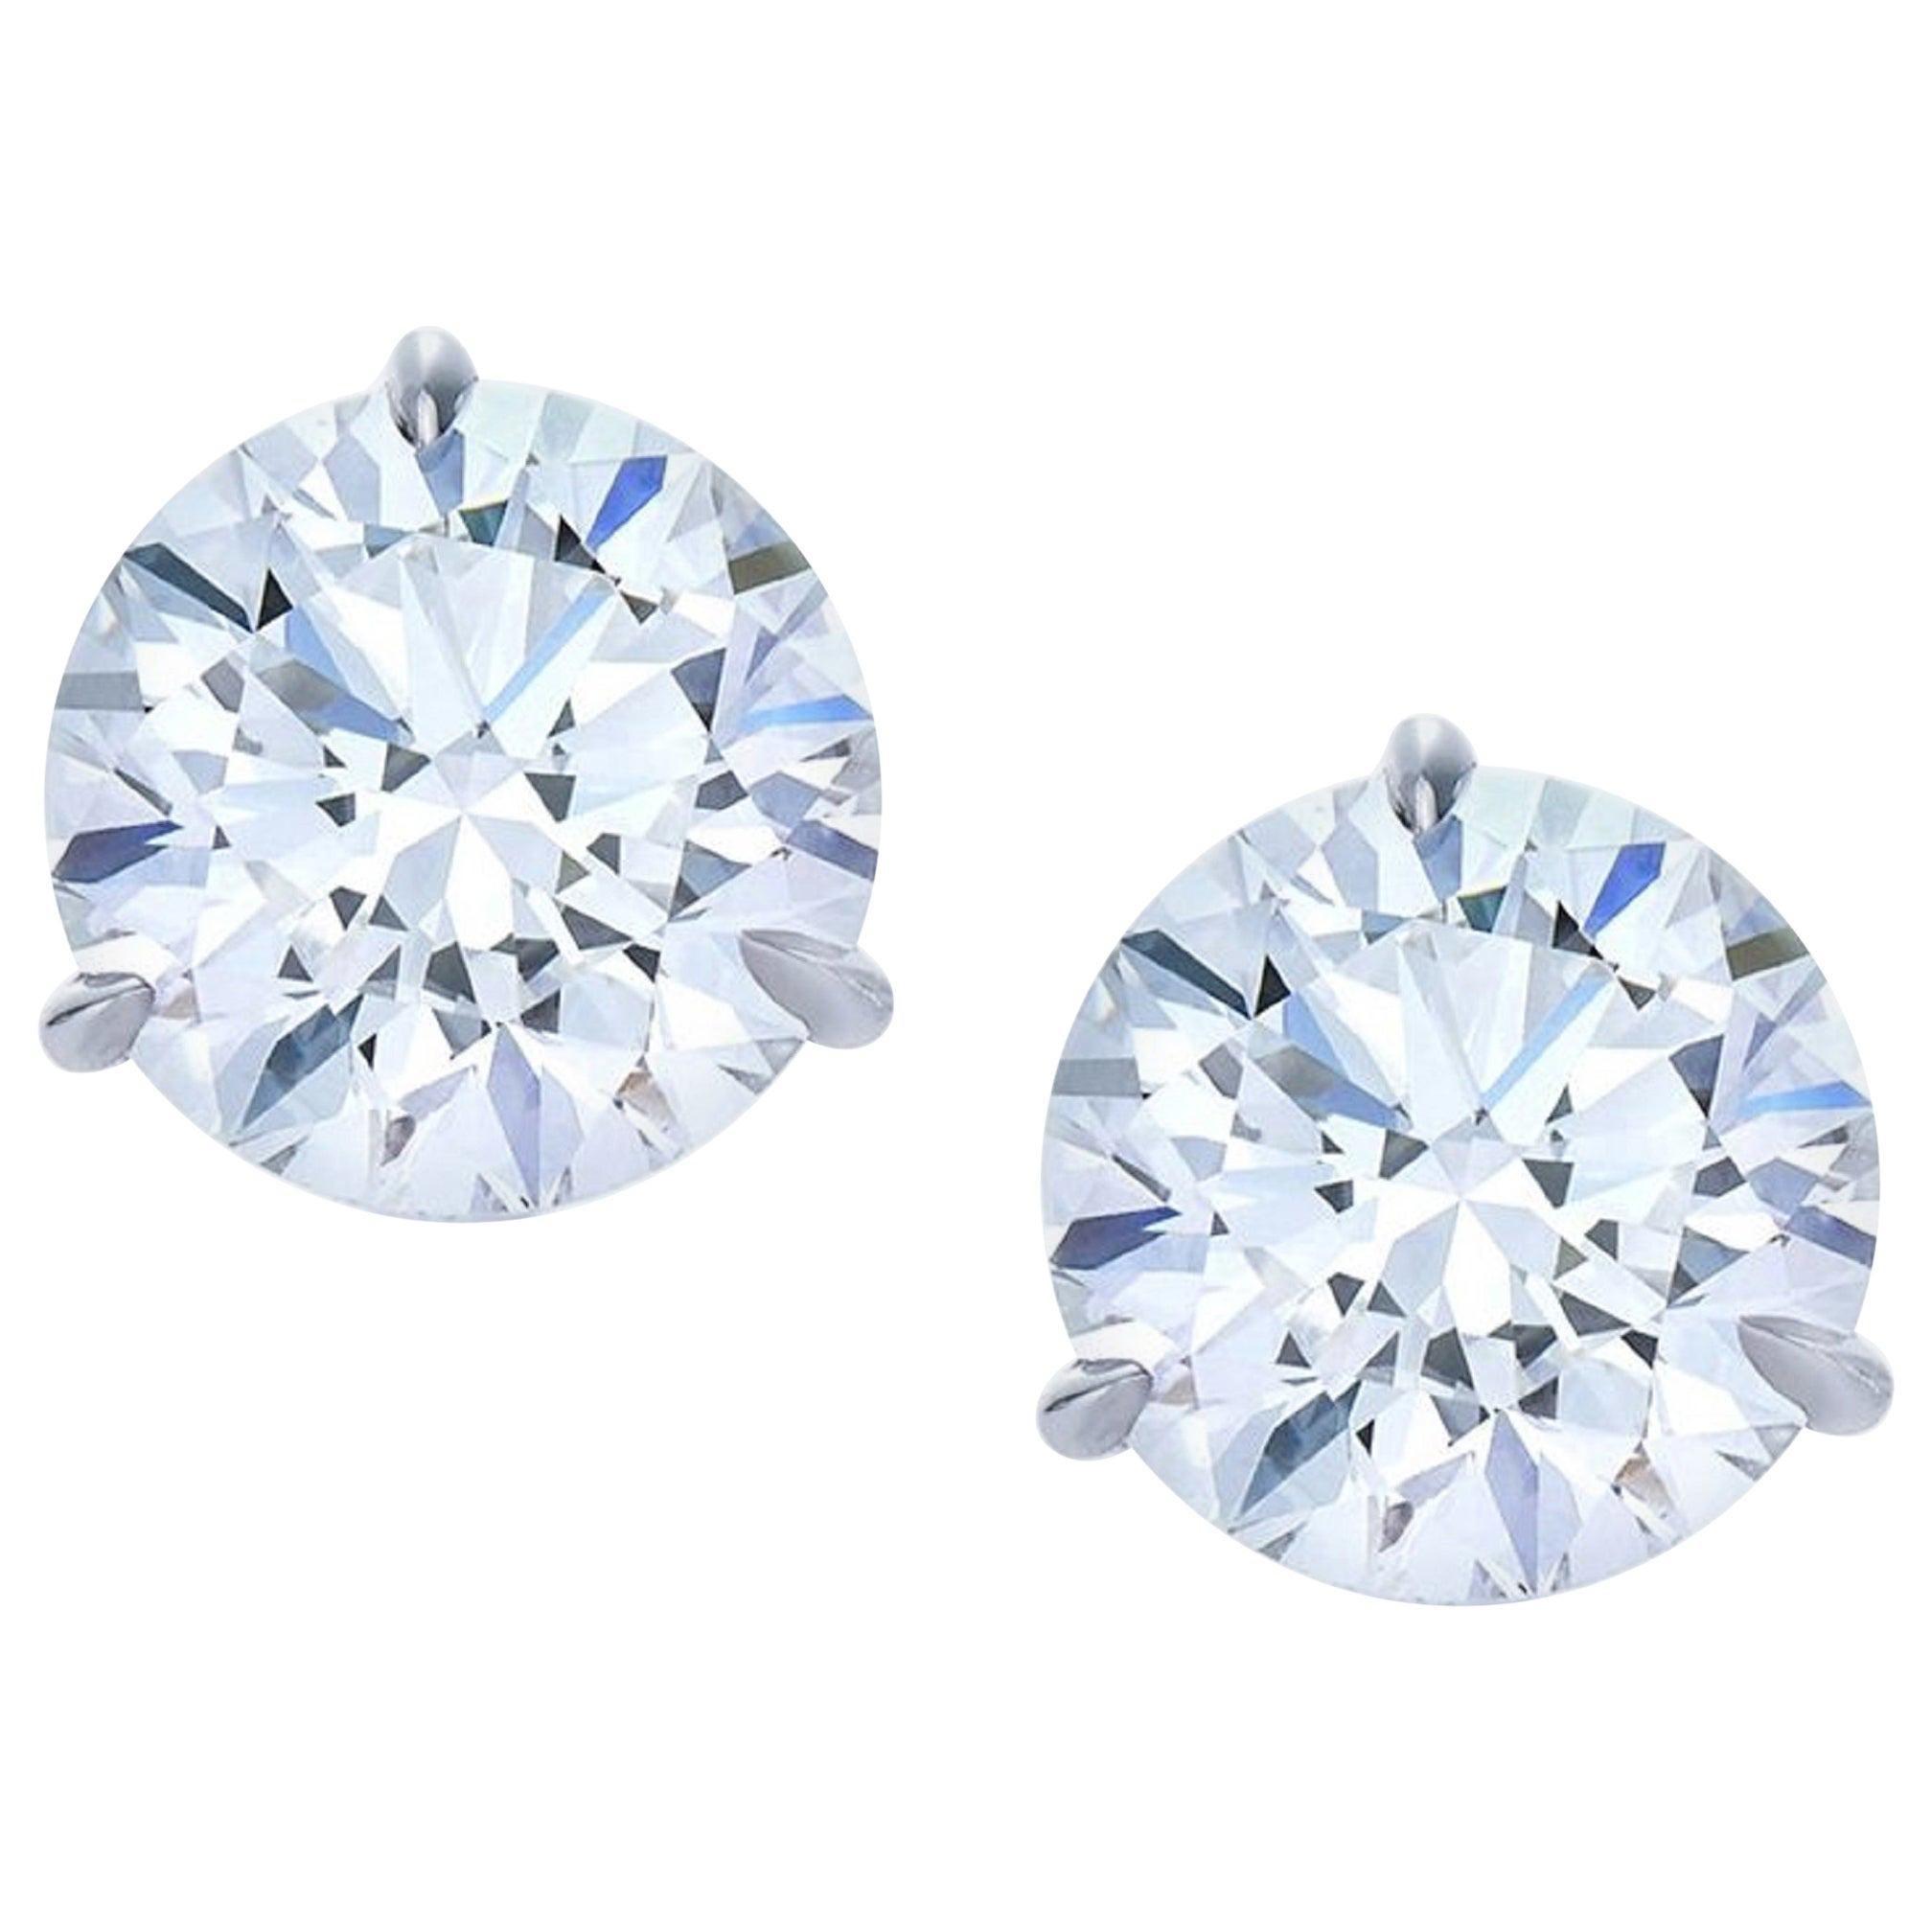 I Flawless GIA Certified 4.01 Carat Round Brilliant Cut Diamond Studs